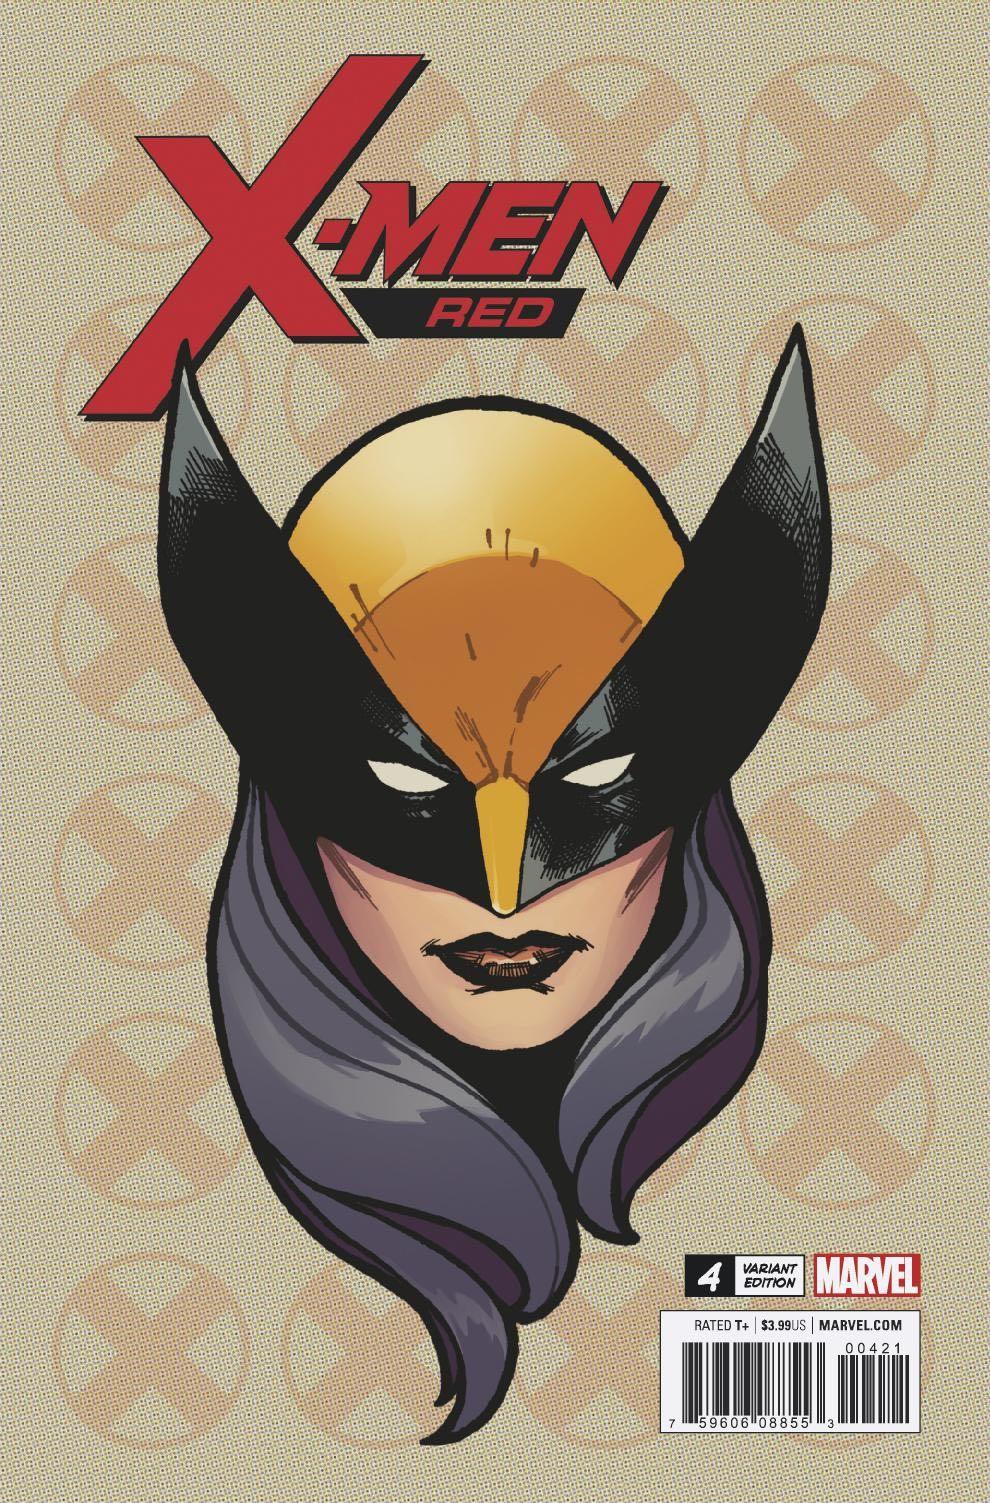 X-Men Red Vol 1 4 Headshot Variant.jpg